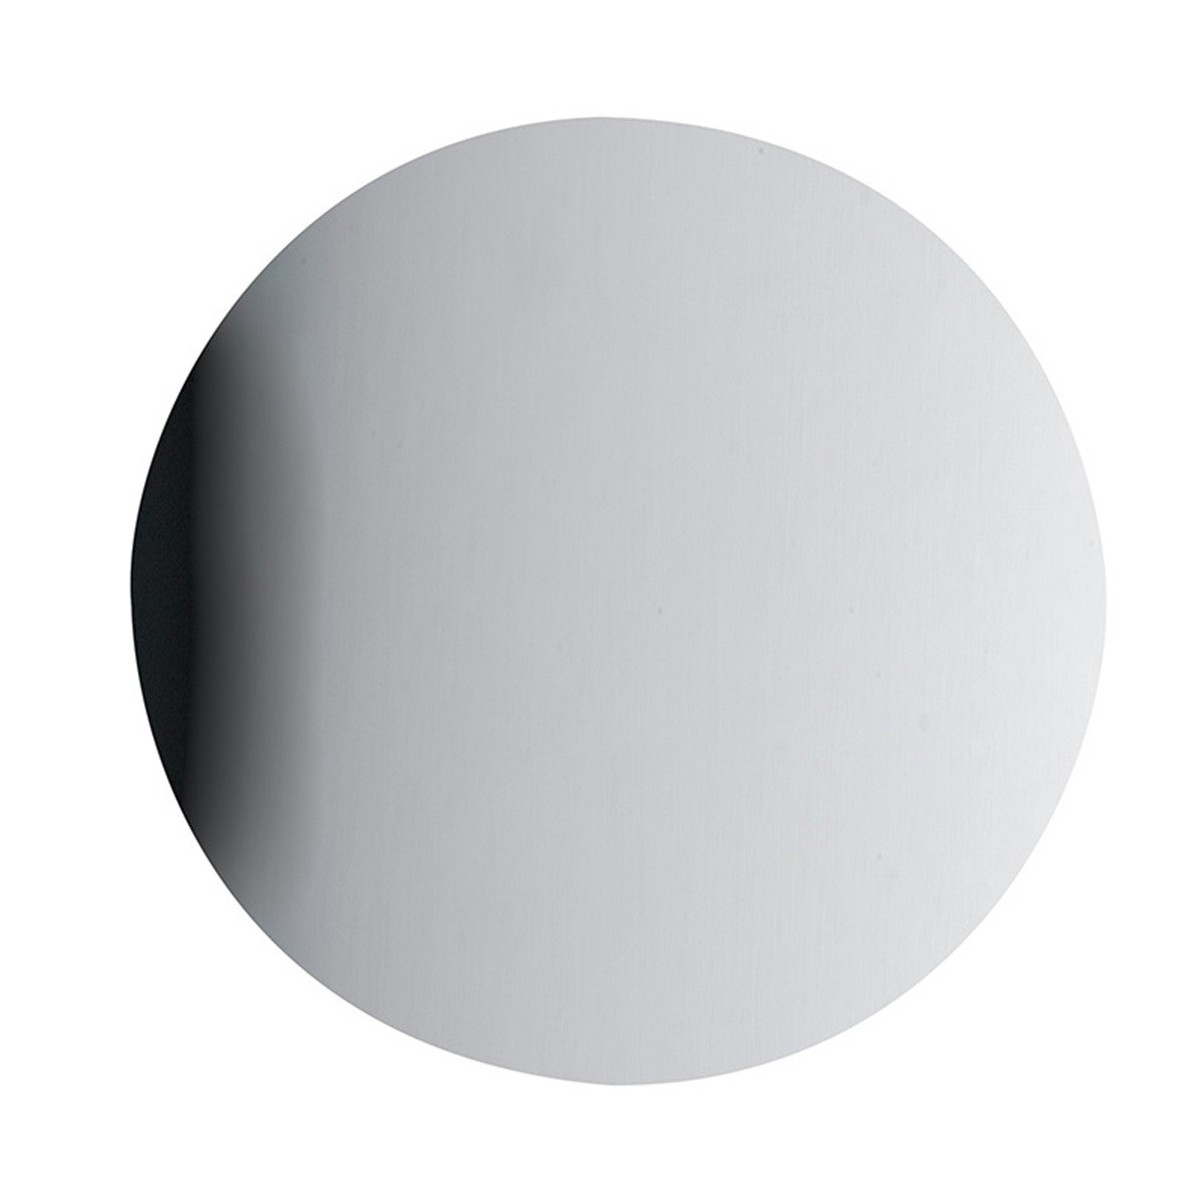 LED-ECLISSE/AP30 CR - Applique Cromo Moderna Tonda Metallo Lampada Led 11 watt Luce Naturale